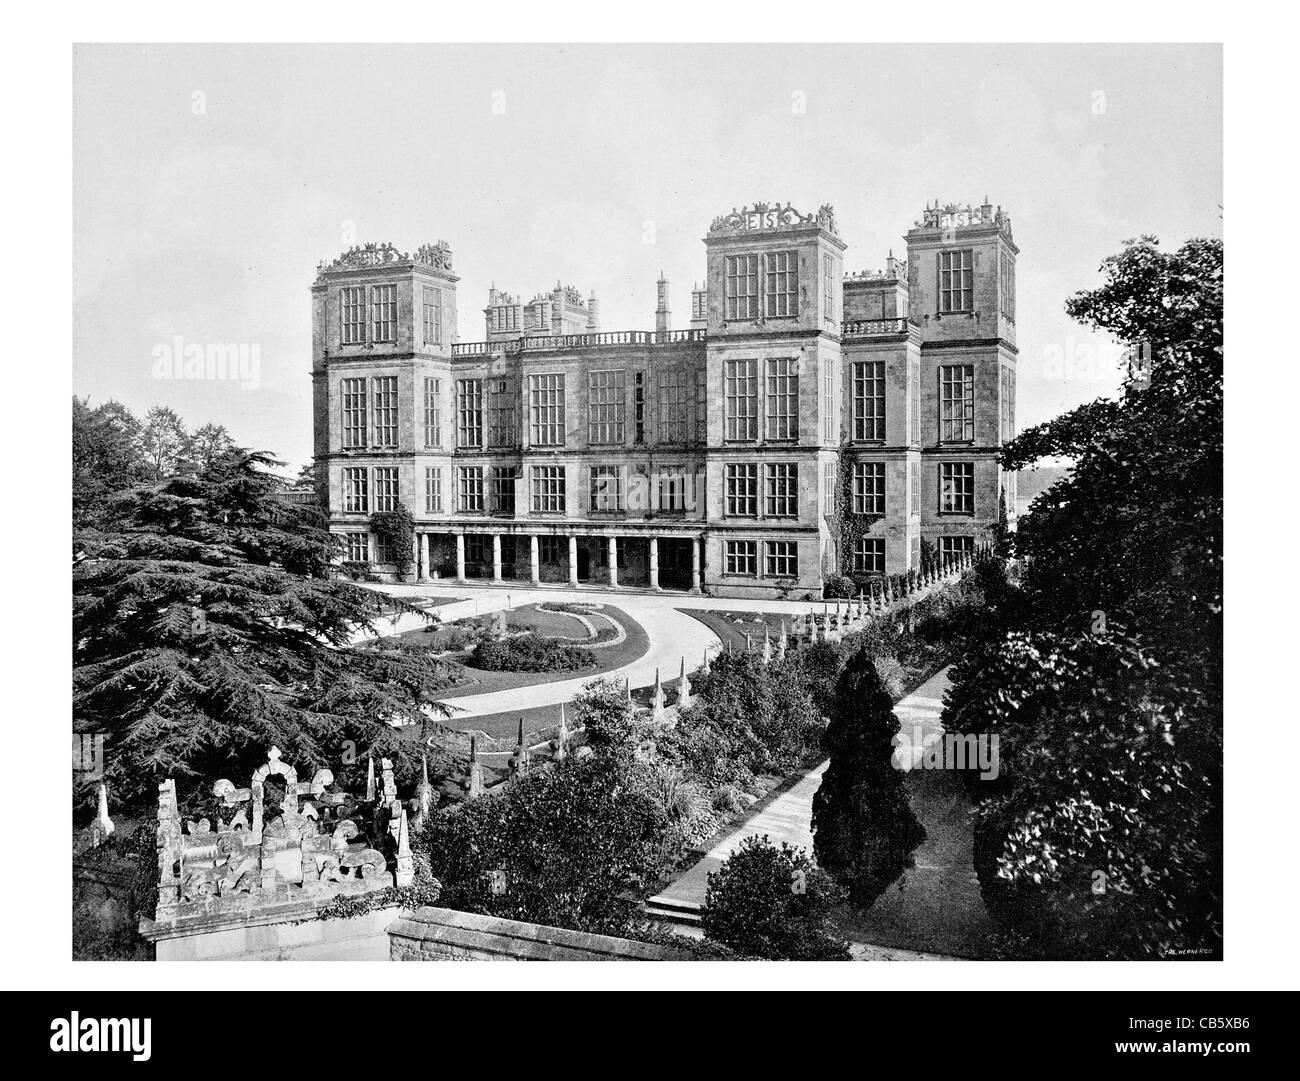 Hardwick Hall Derbyshire Elizabethan country houses England Robert Smythson Renaissance style - Stock Image